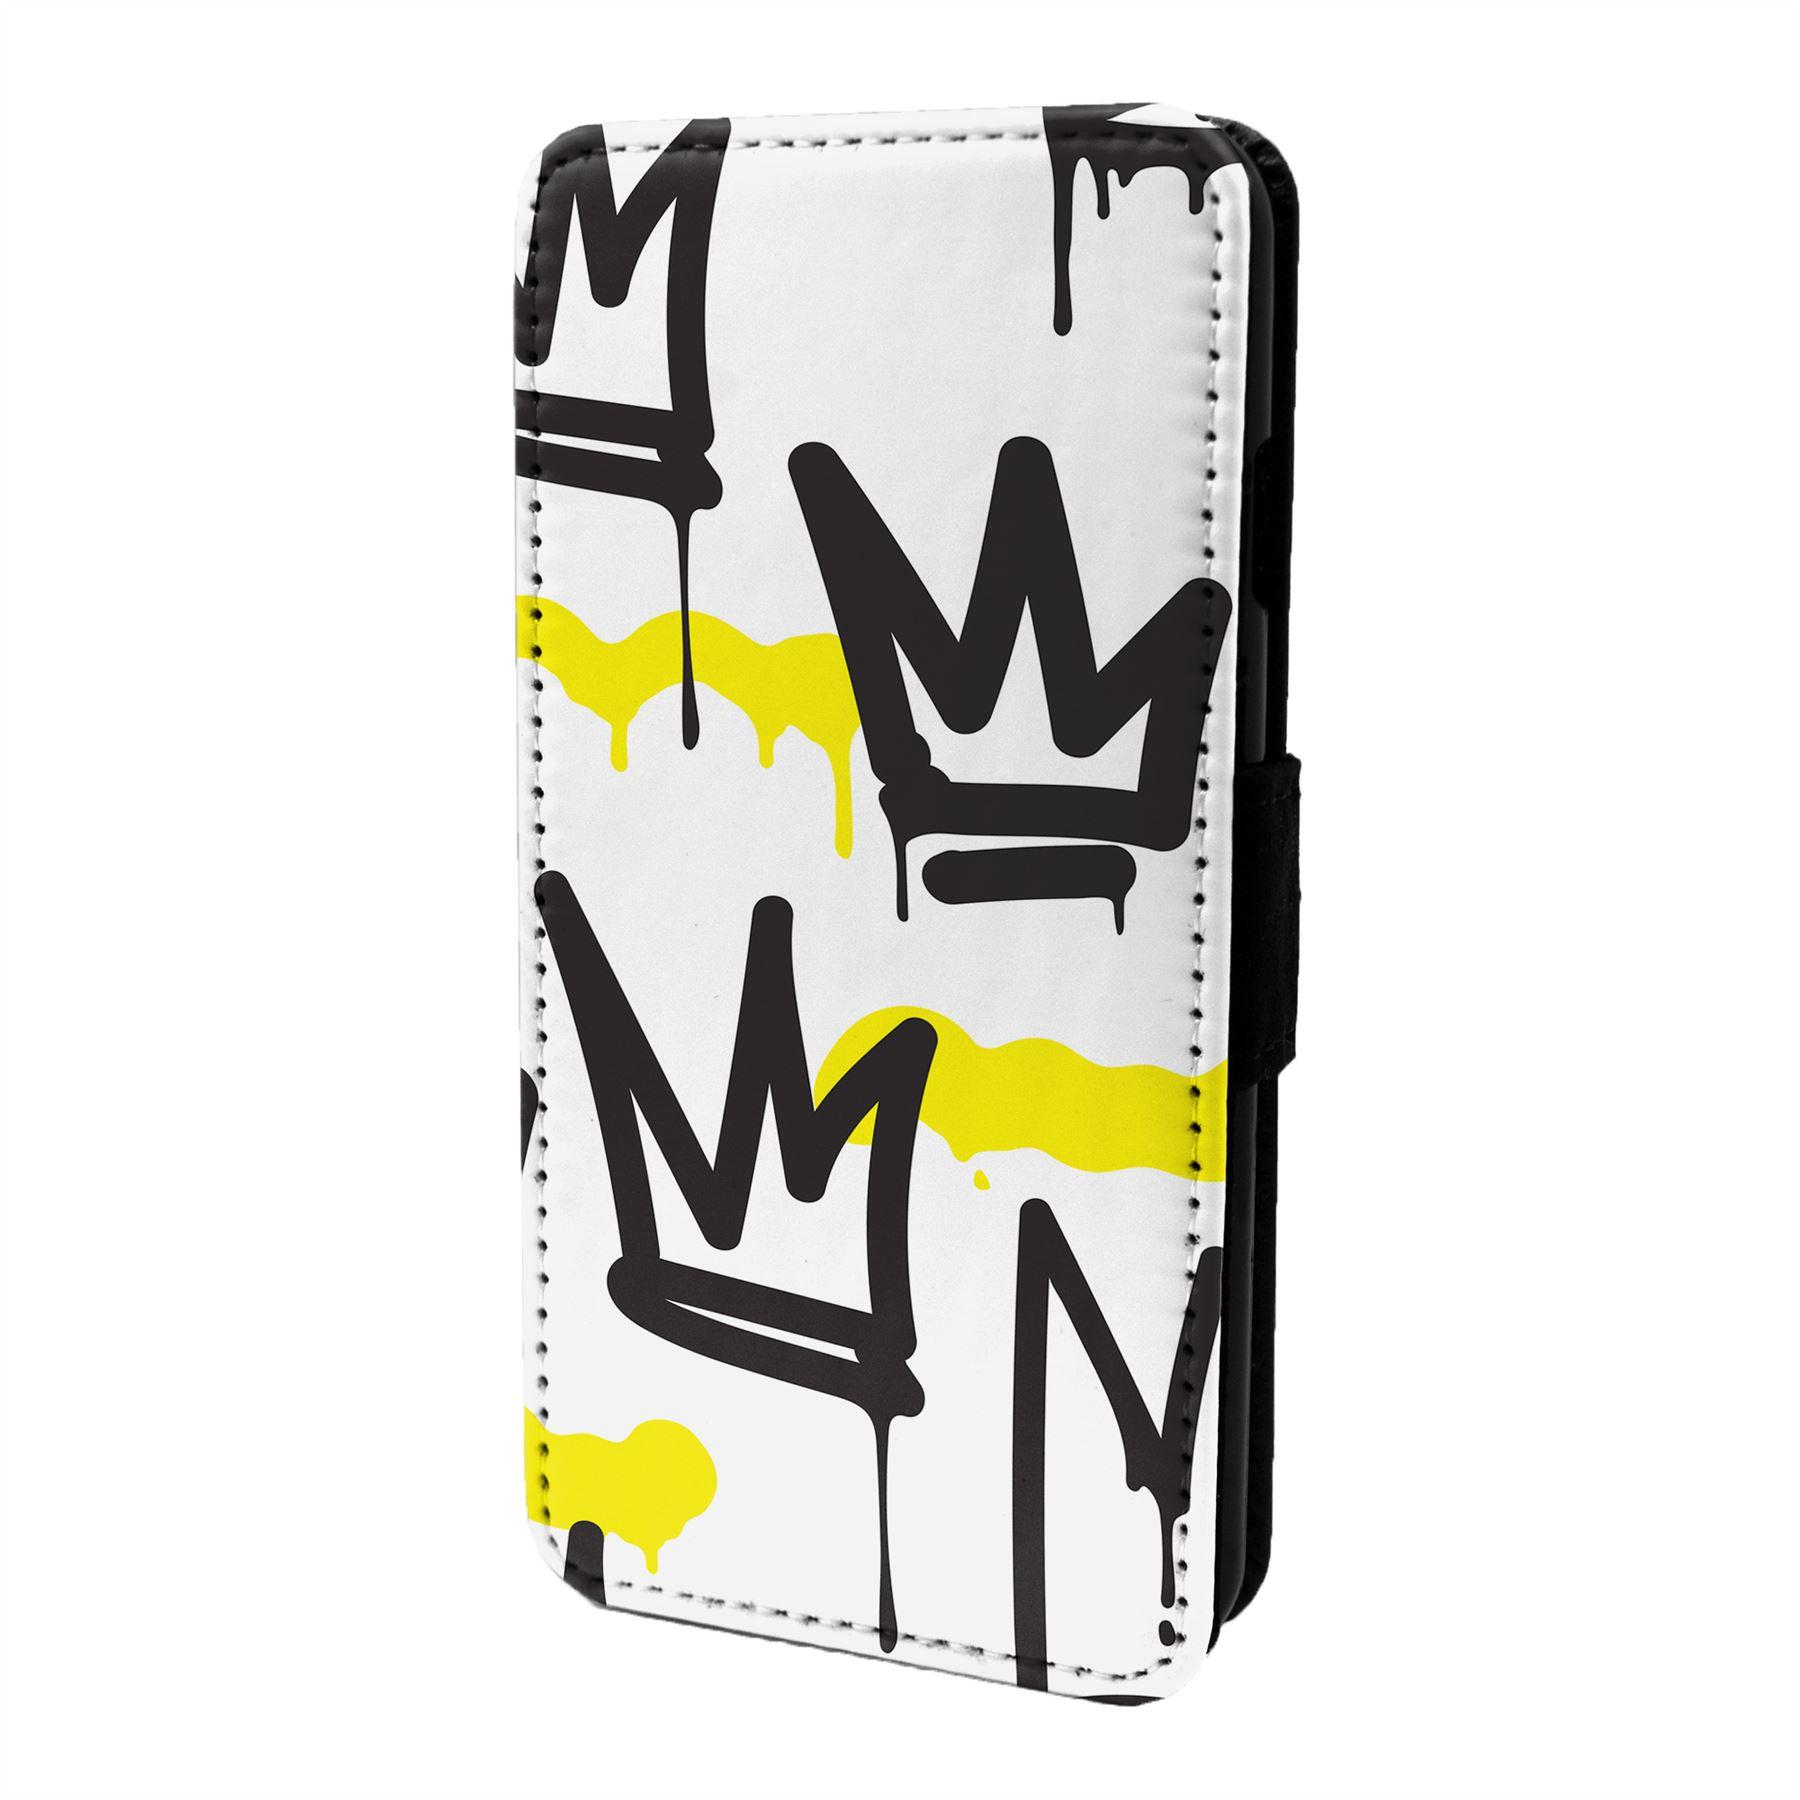 Graffiti-Art-Etui-Rabattable-pour-Telephone-Portable-S6777